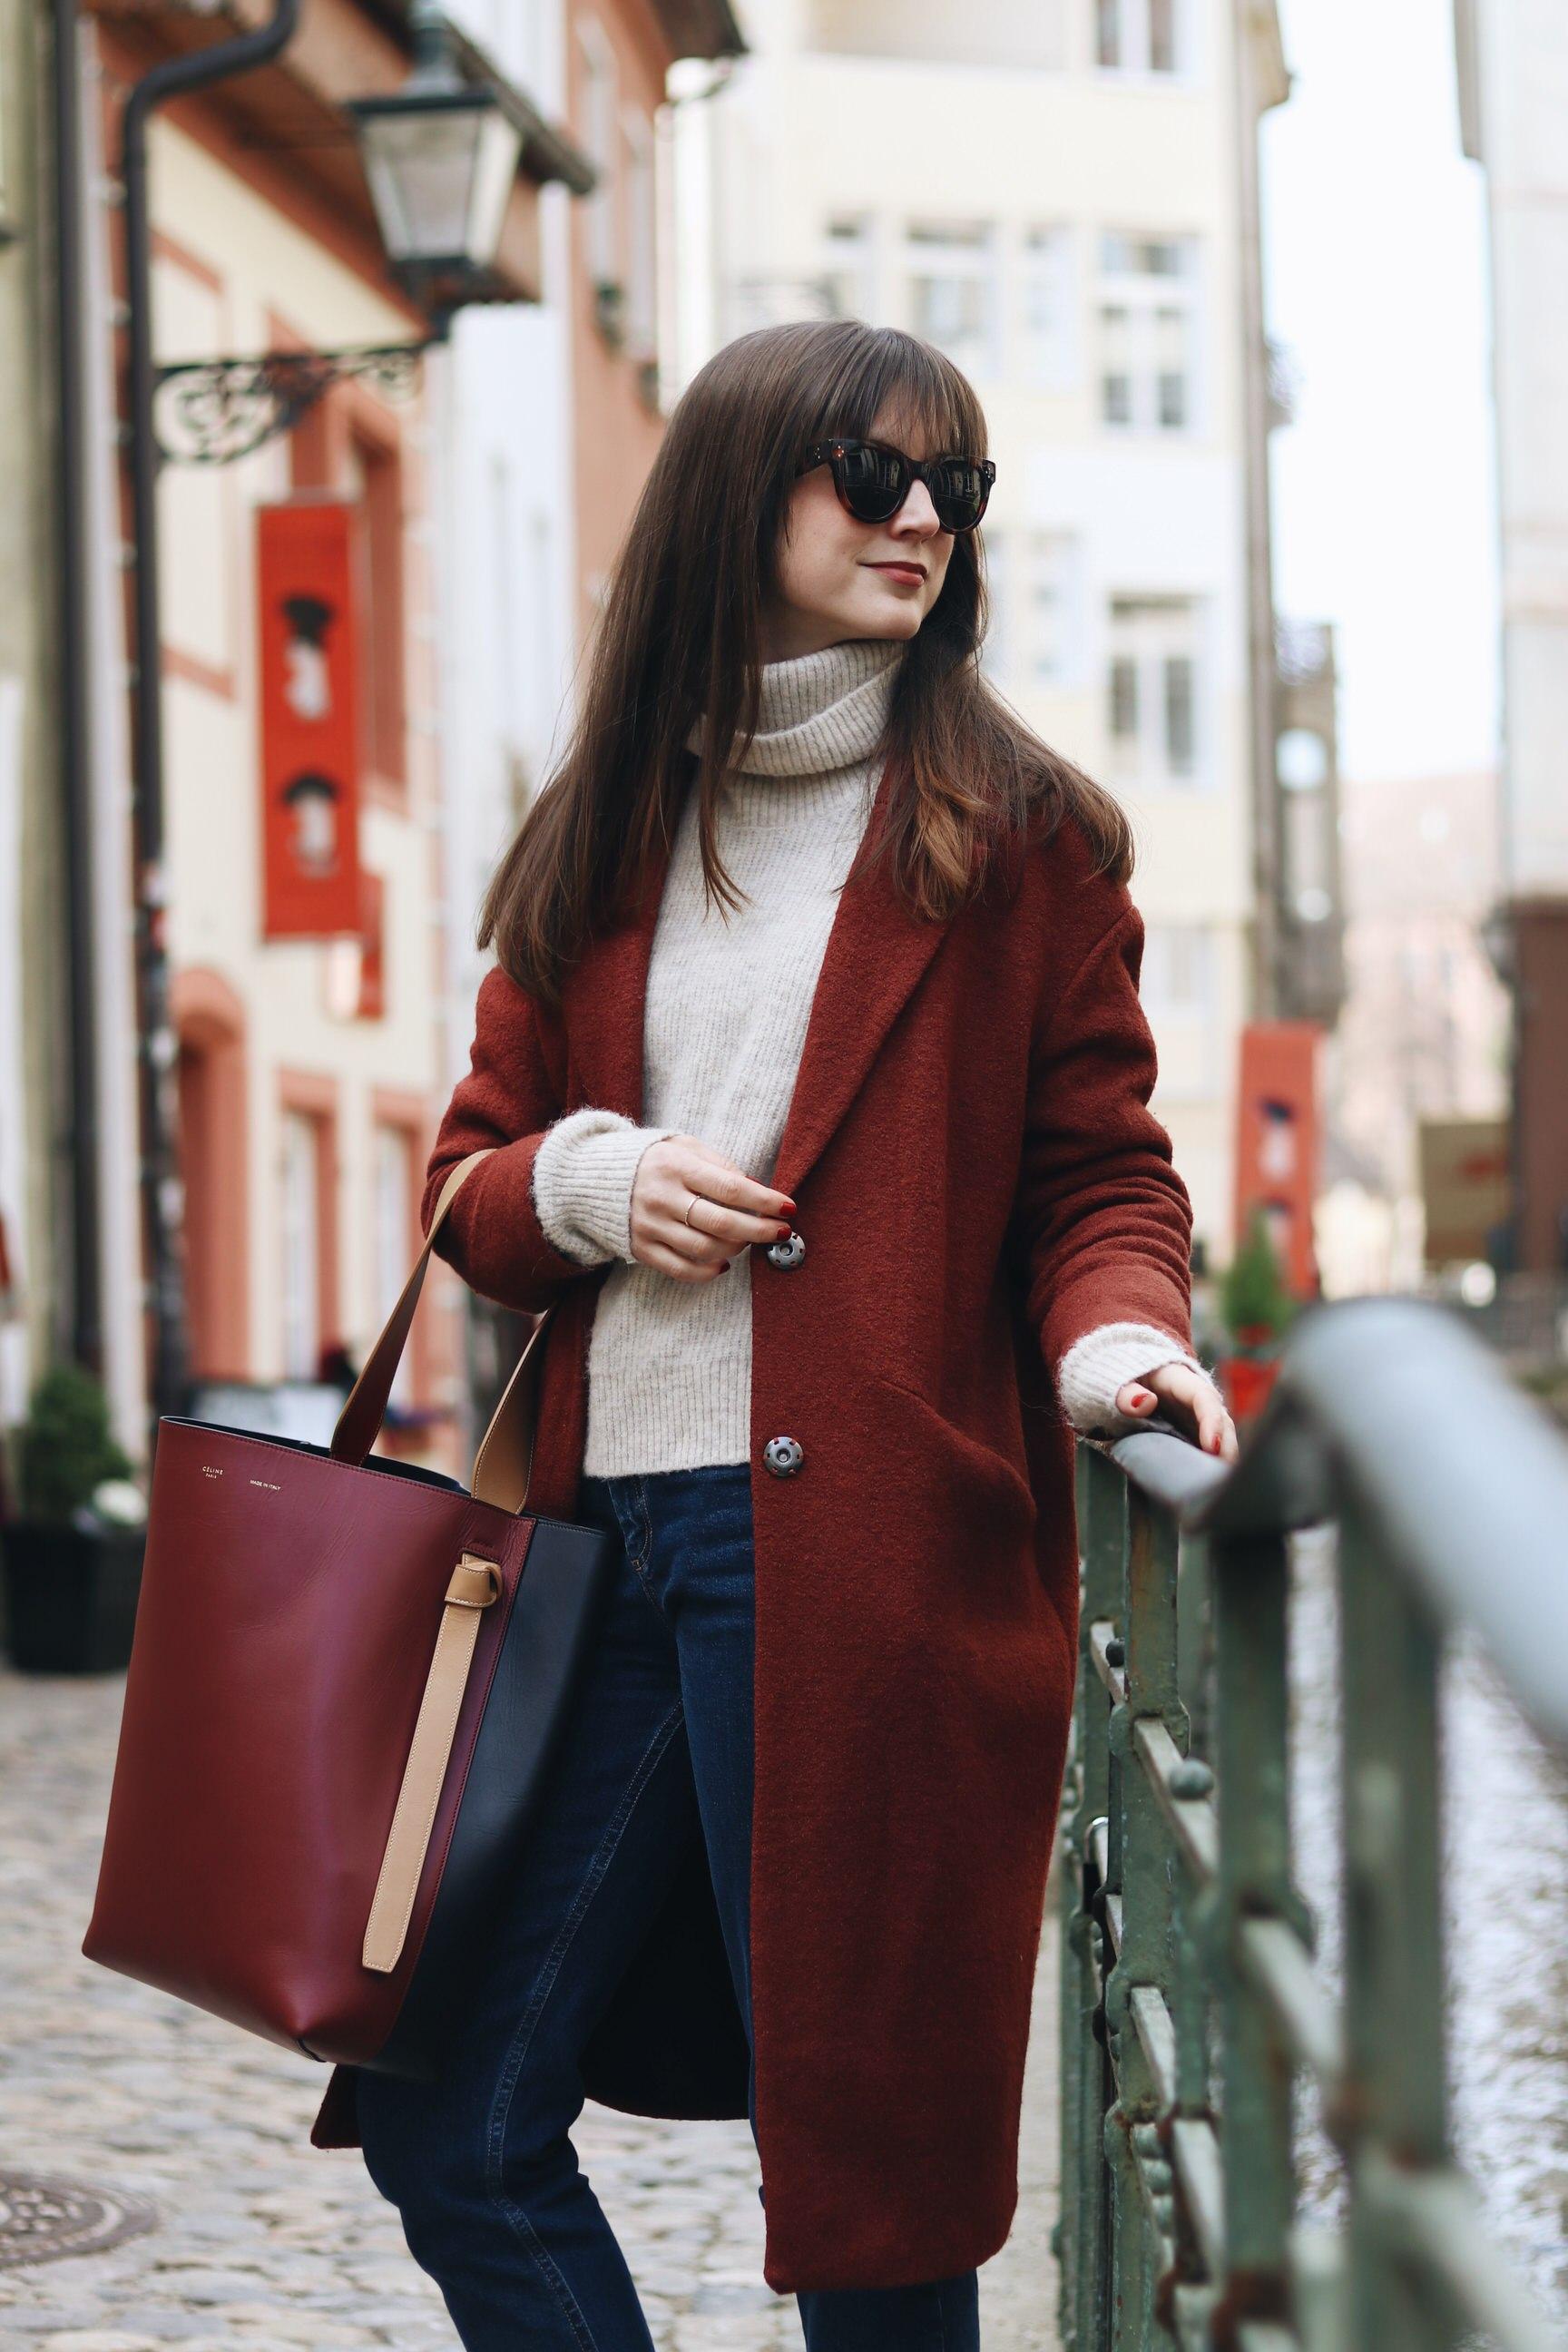 Céline Outfit Sonnenbrille Tasche rot Modeblog Taschentrends Winter Look Fashionblog Blog Neele